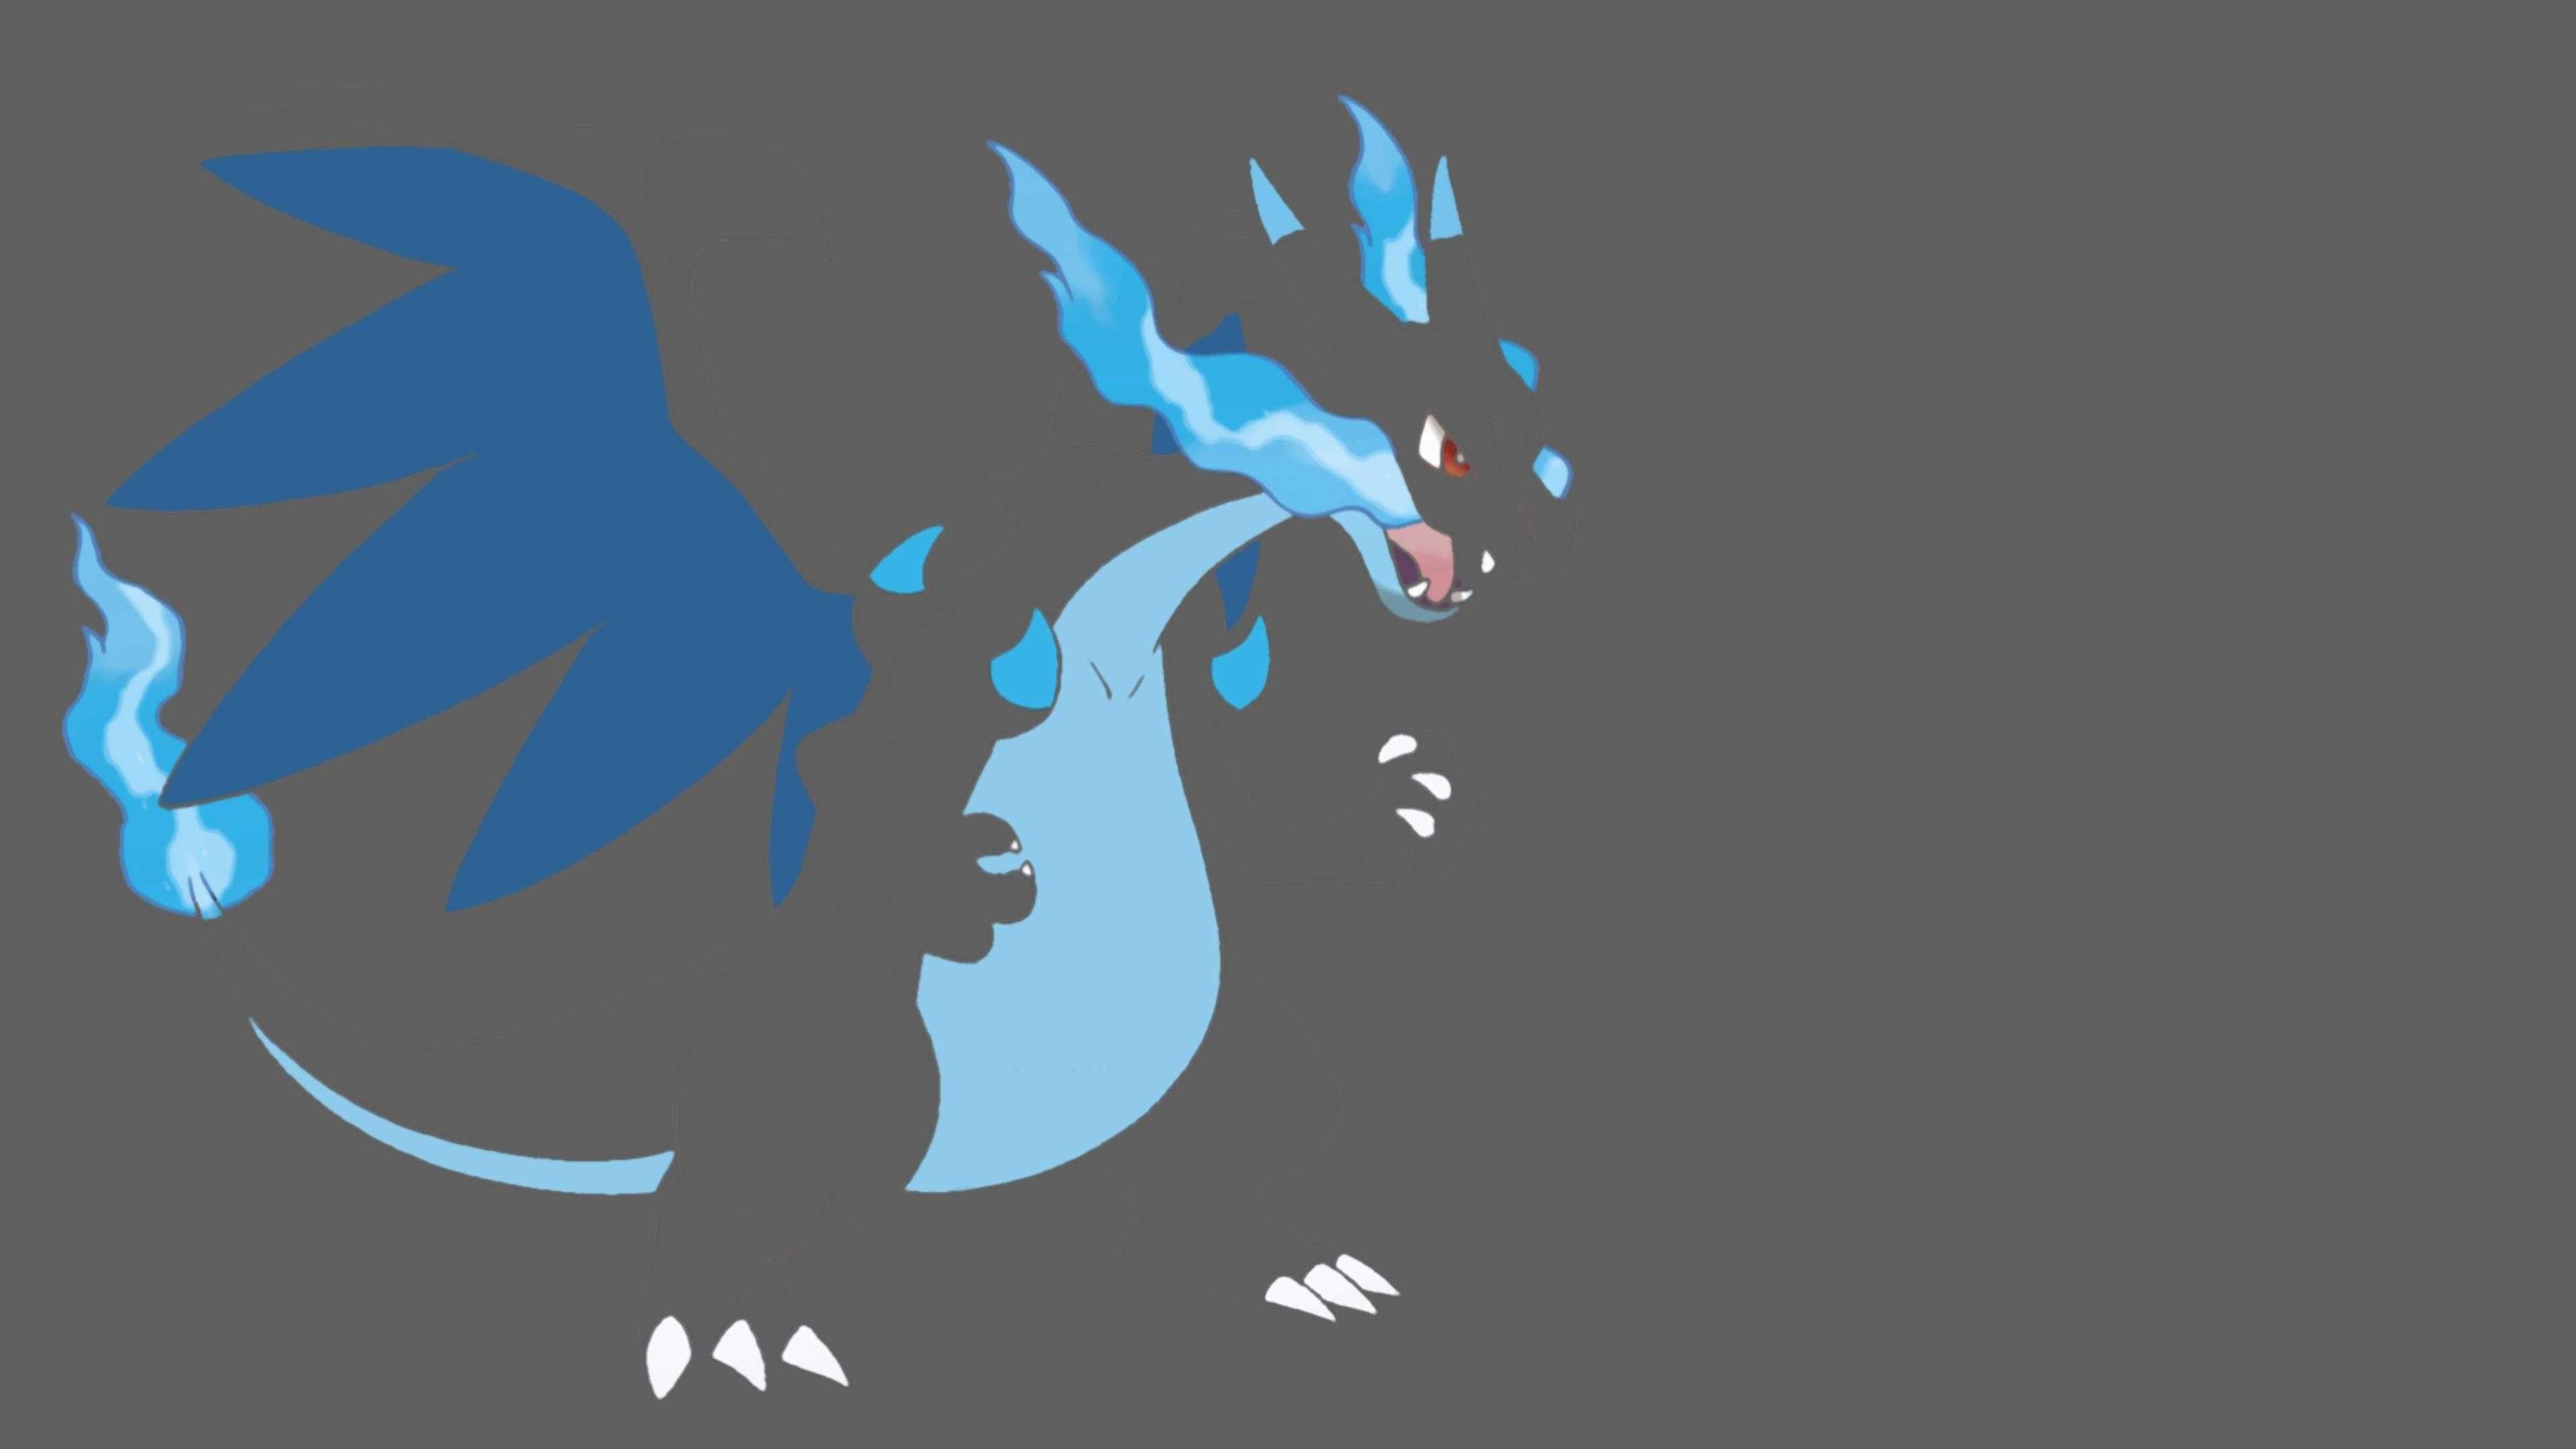 Res: 3840x2160, pokemon charizard x wallpaper - http://hdwallpaper.info/pokemon-charizard-x- wallpaper/ HD Wallpapers